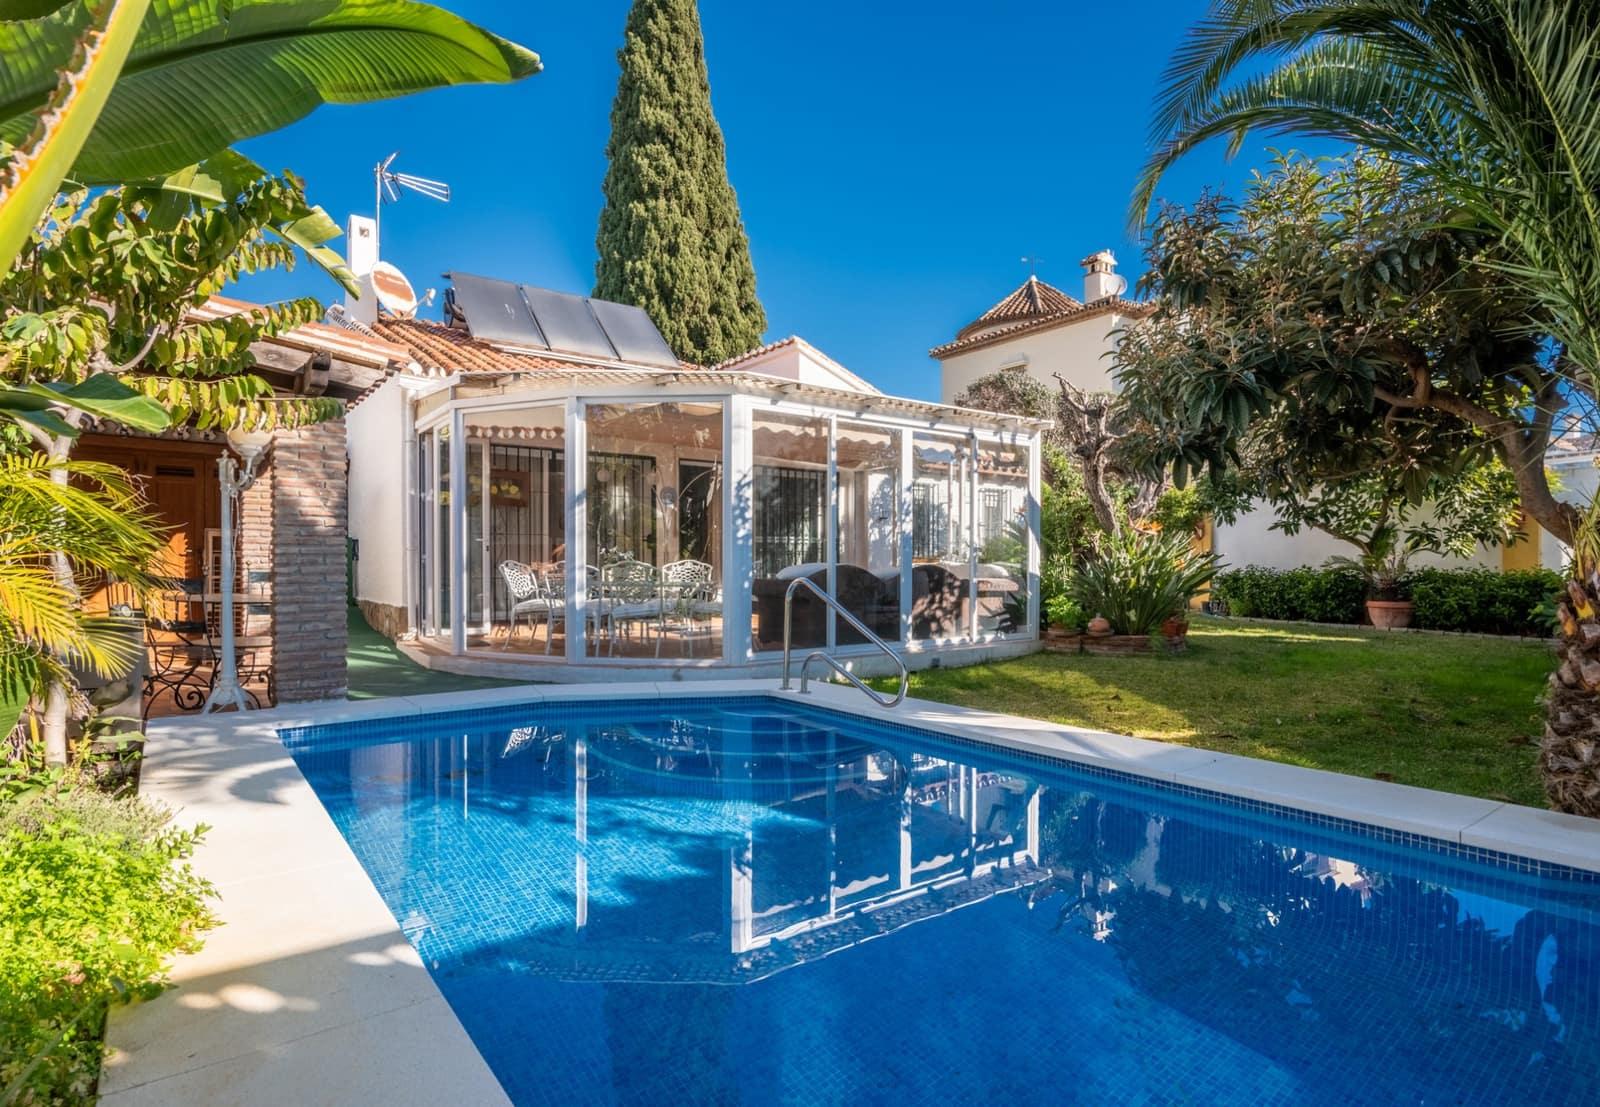 2 chambre Bungalow à vendre à Marbella avec piscine - 1 790 000 € (Ref: 5709801)